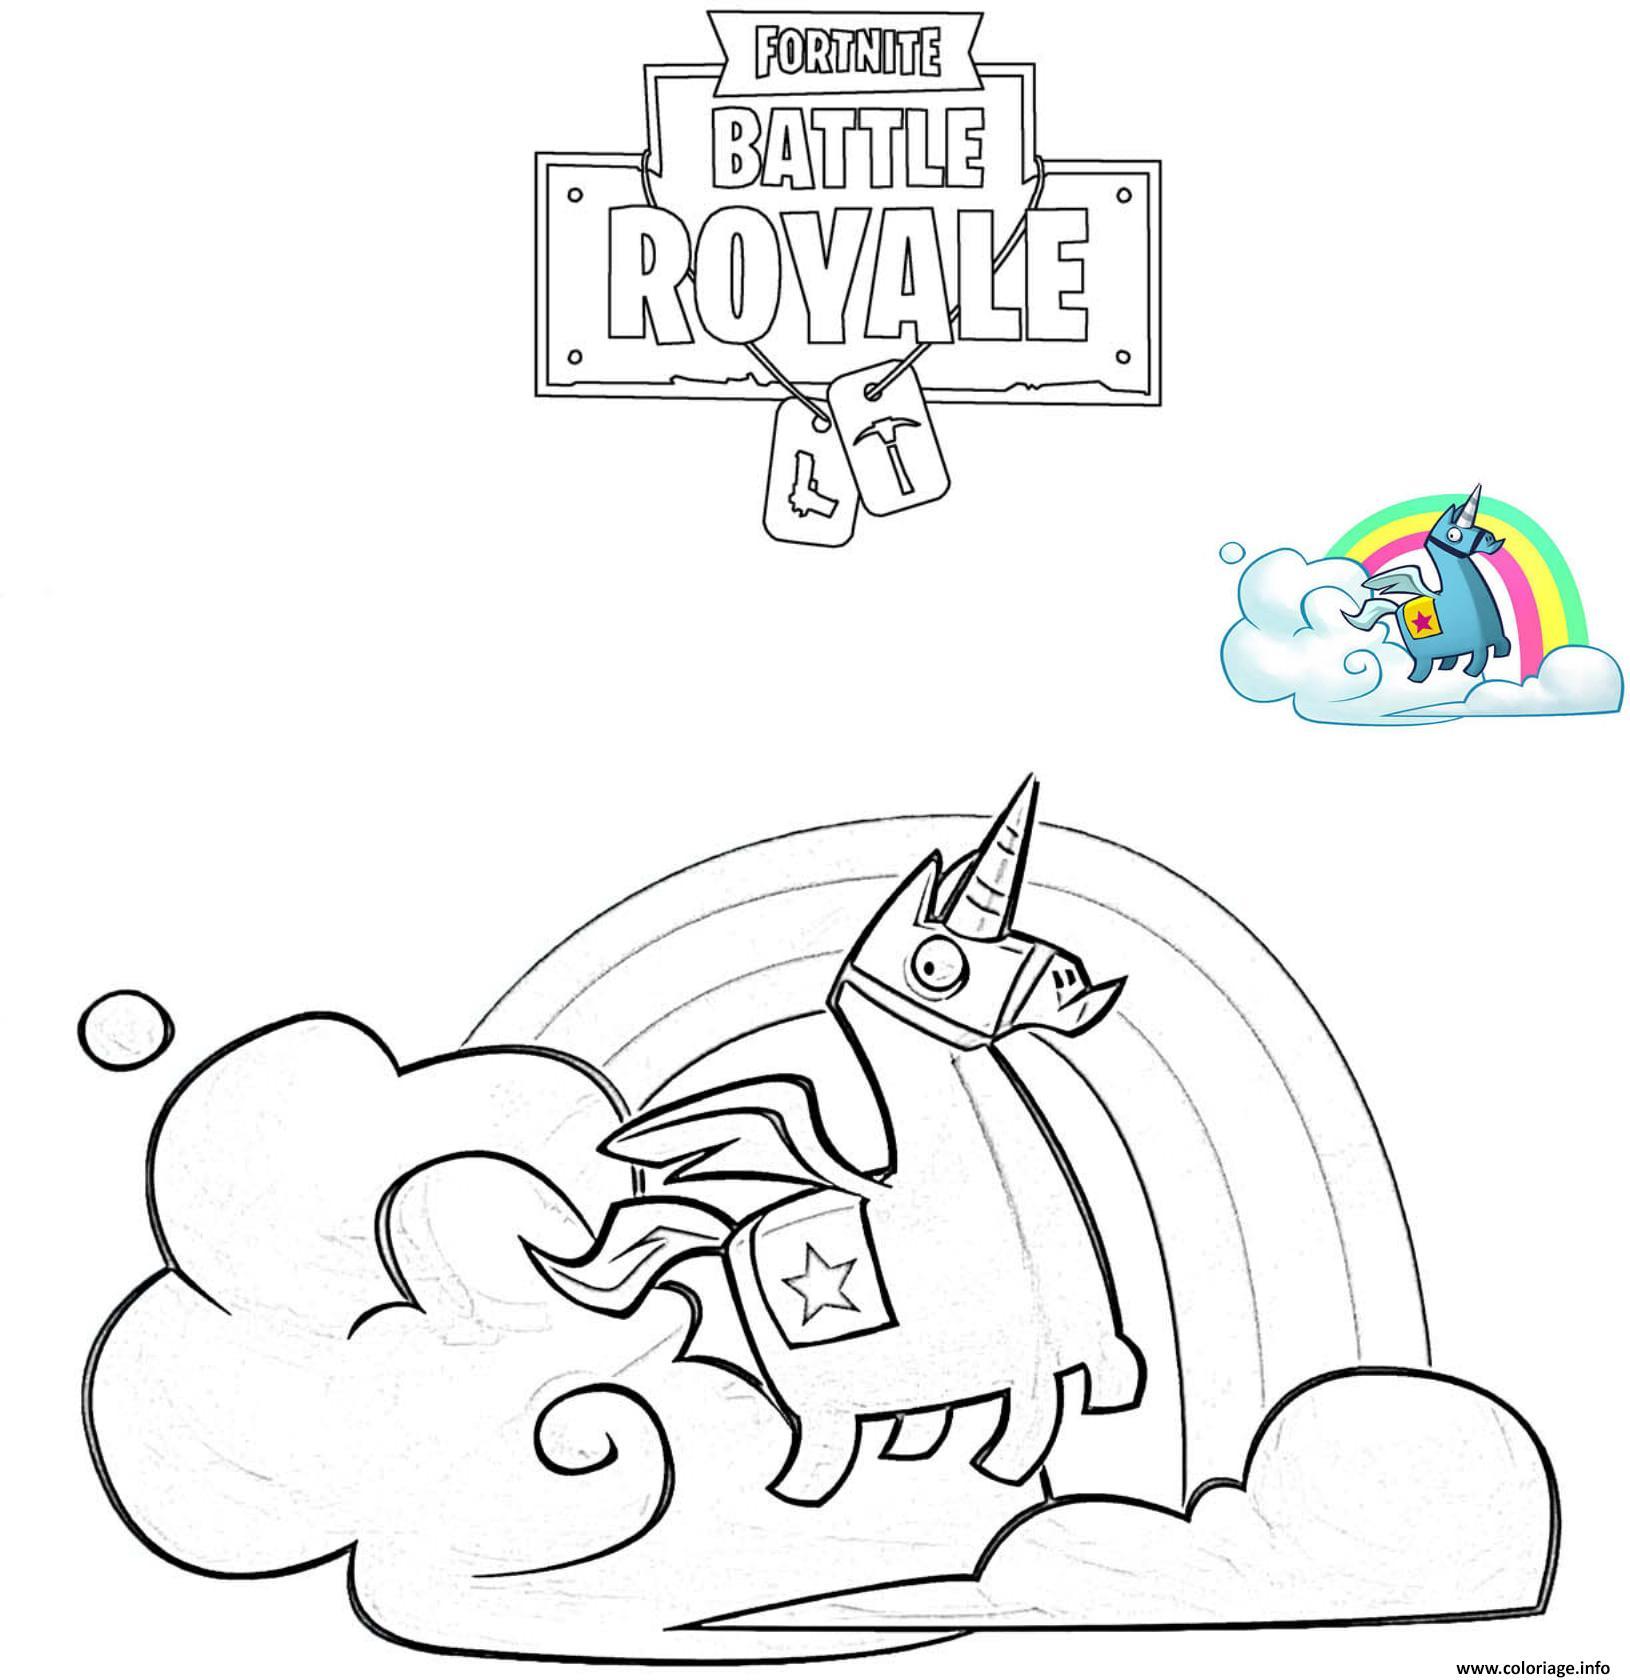 Llama De Fortnite Para Colorear Fortnite Battle Royale